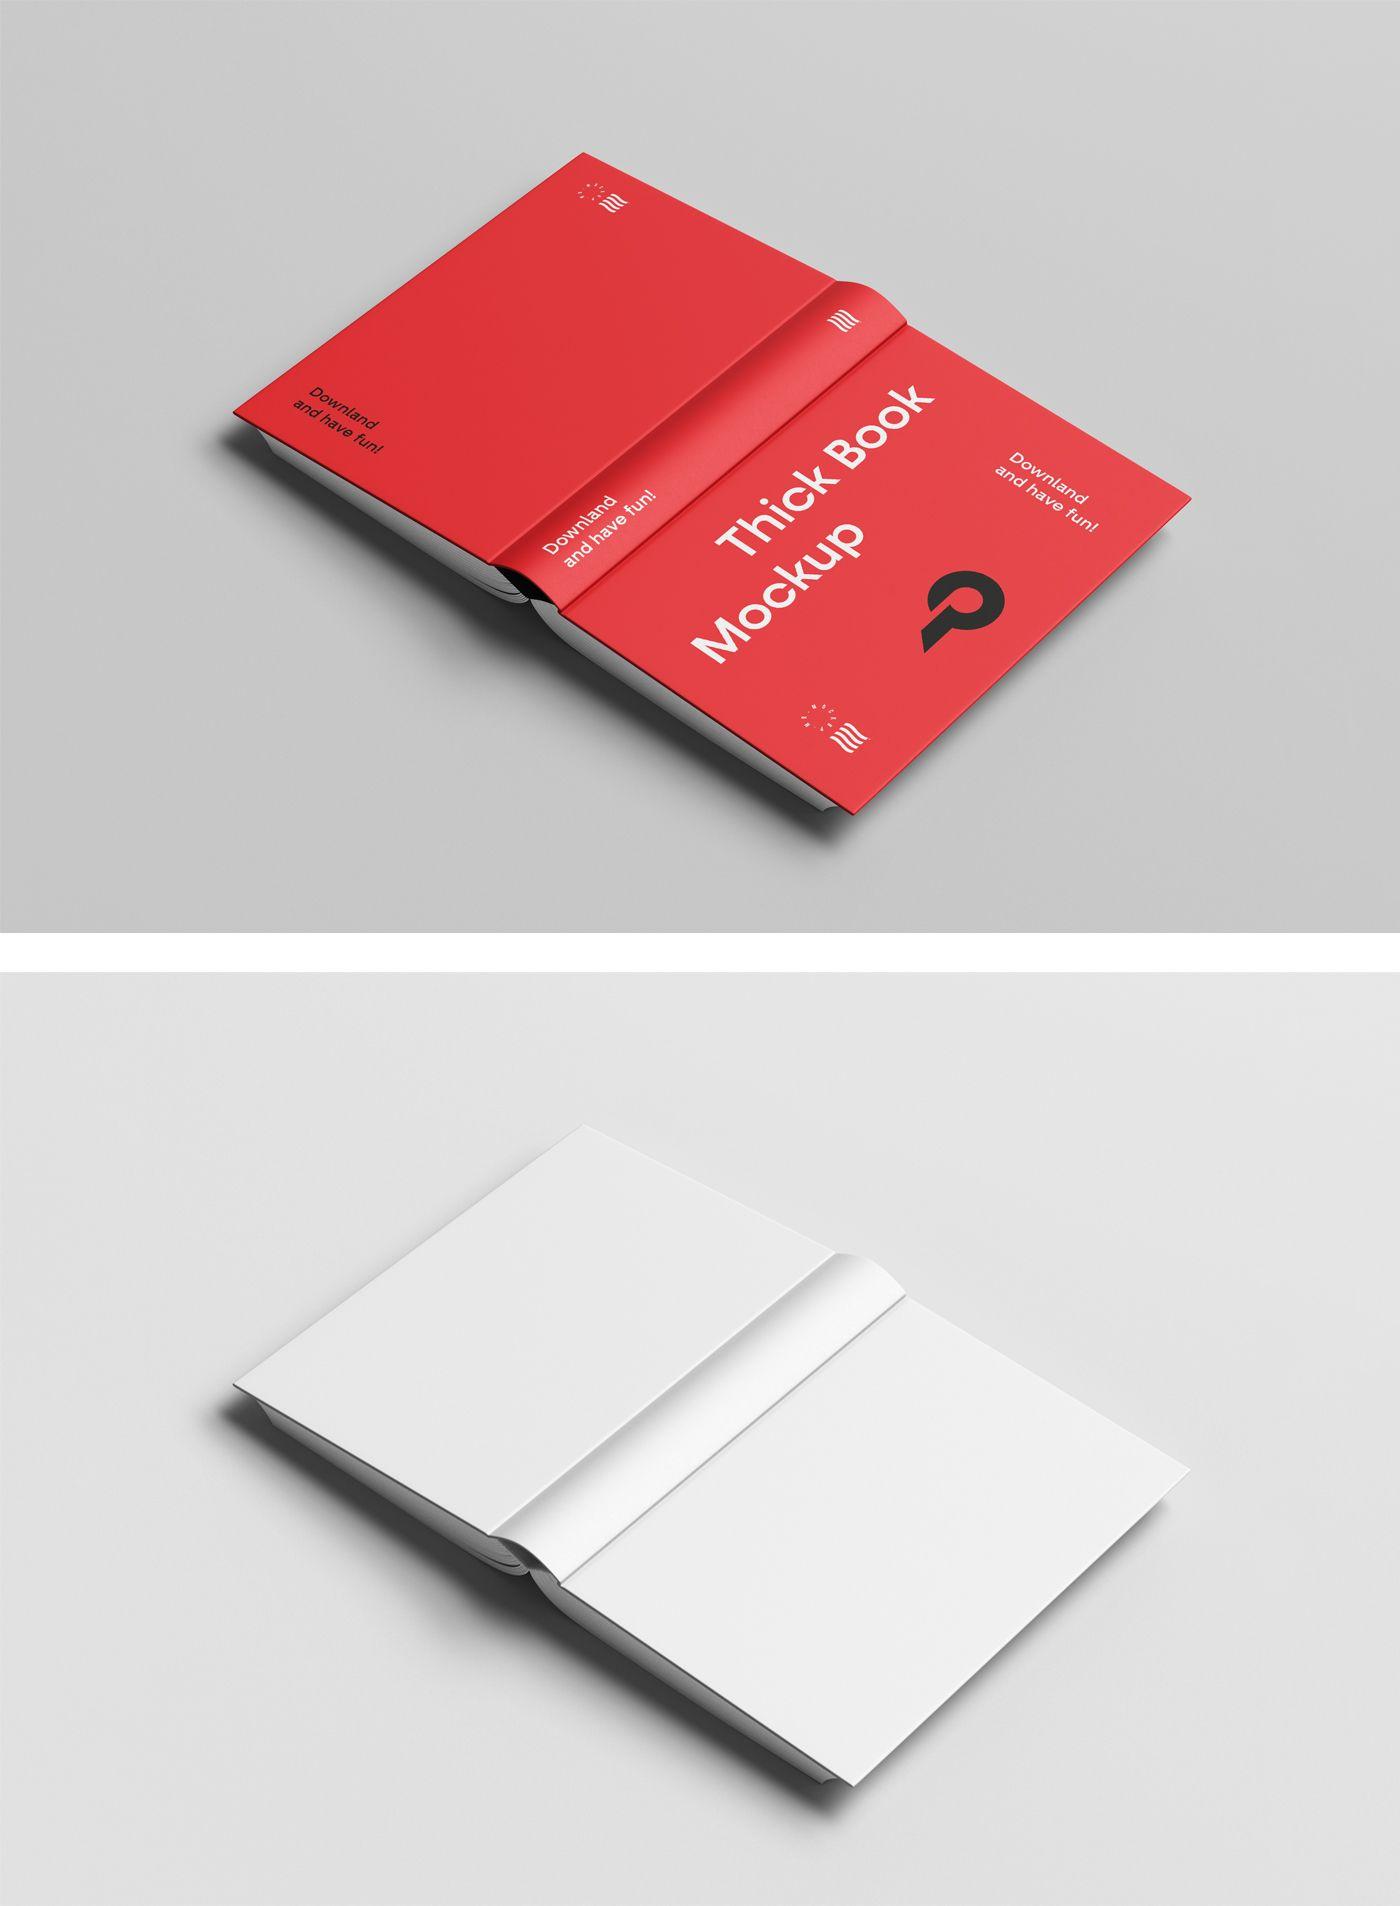 Cover Book Mockup Mr Mockup Graphic Design Freebies Graphic Design Freebies Book Cover Mockup Design Freebie